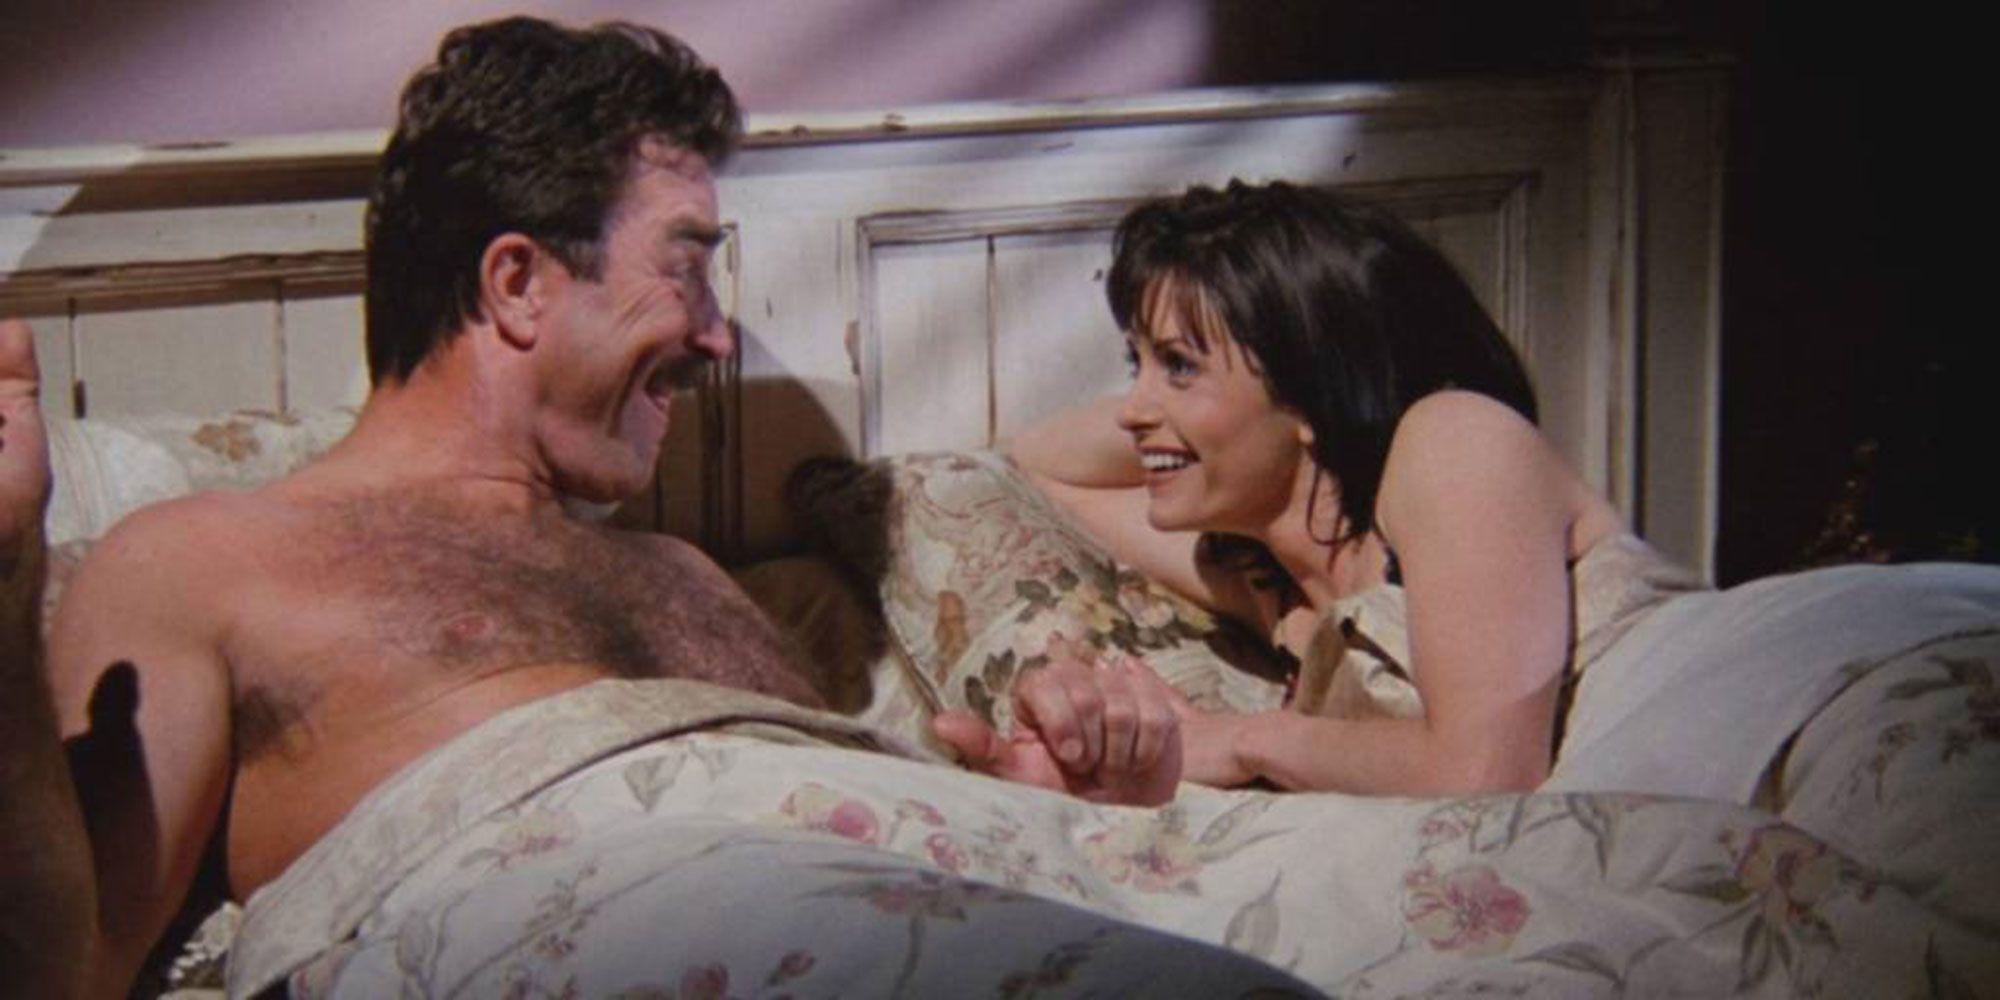 Jack And Mary Make A Porno